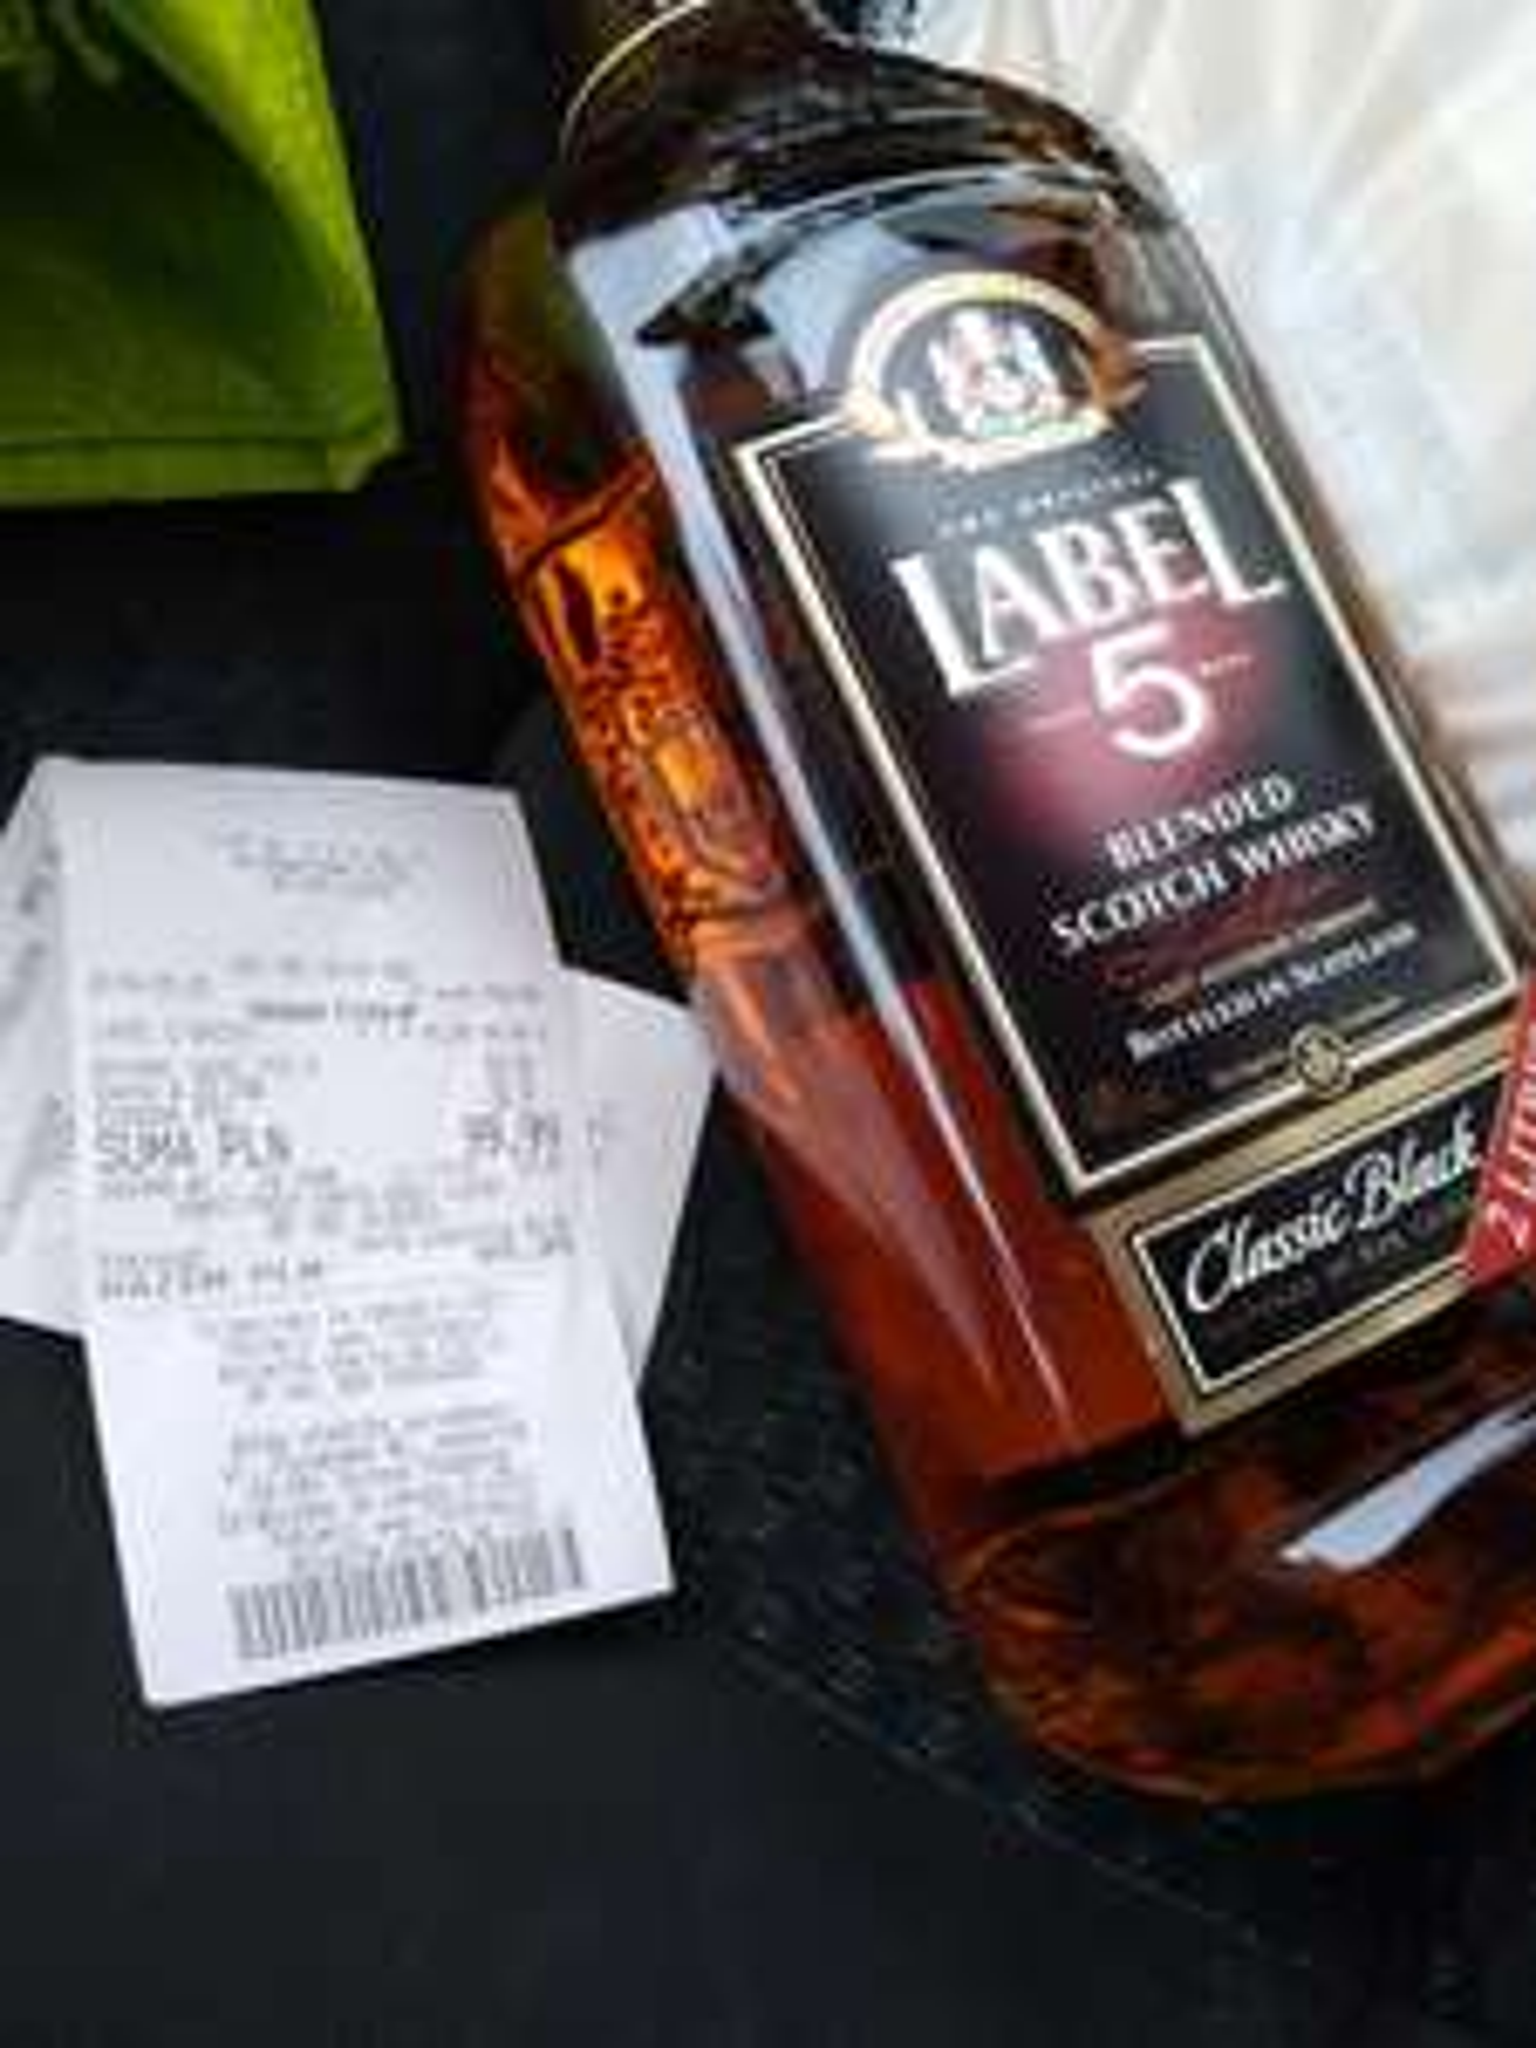 Whiskey label 5 2l @ Lidl Kutno